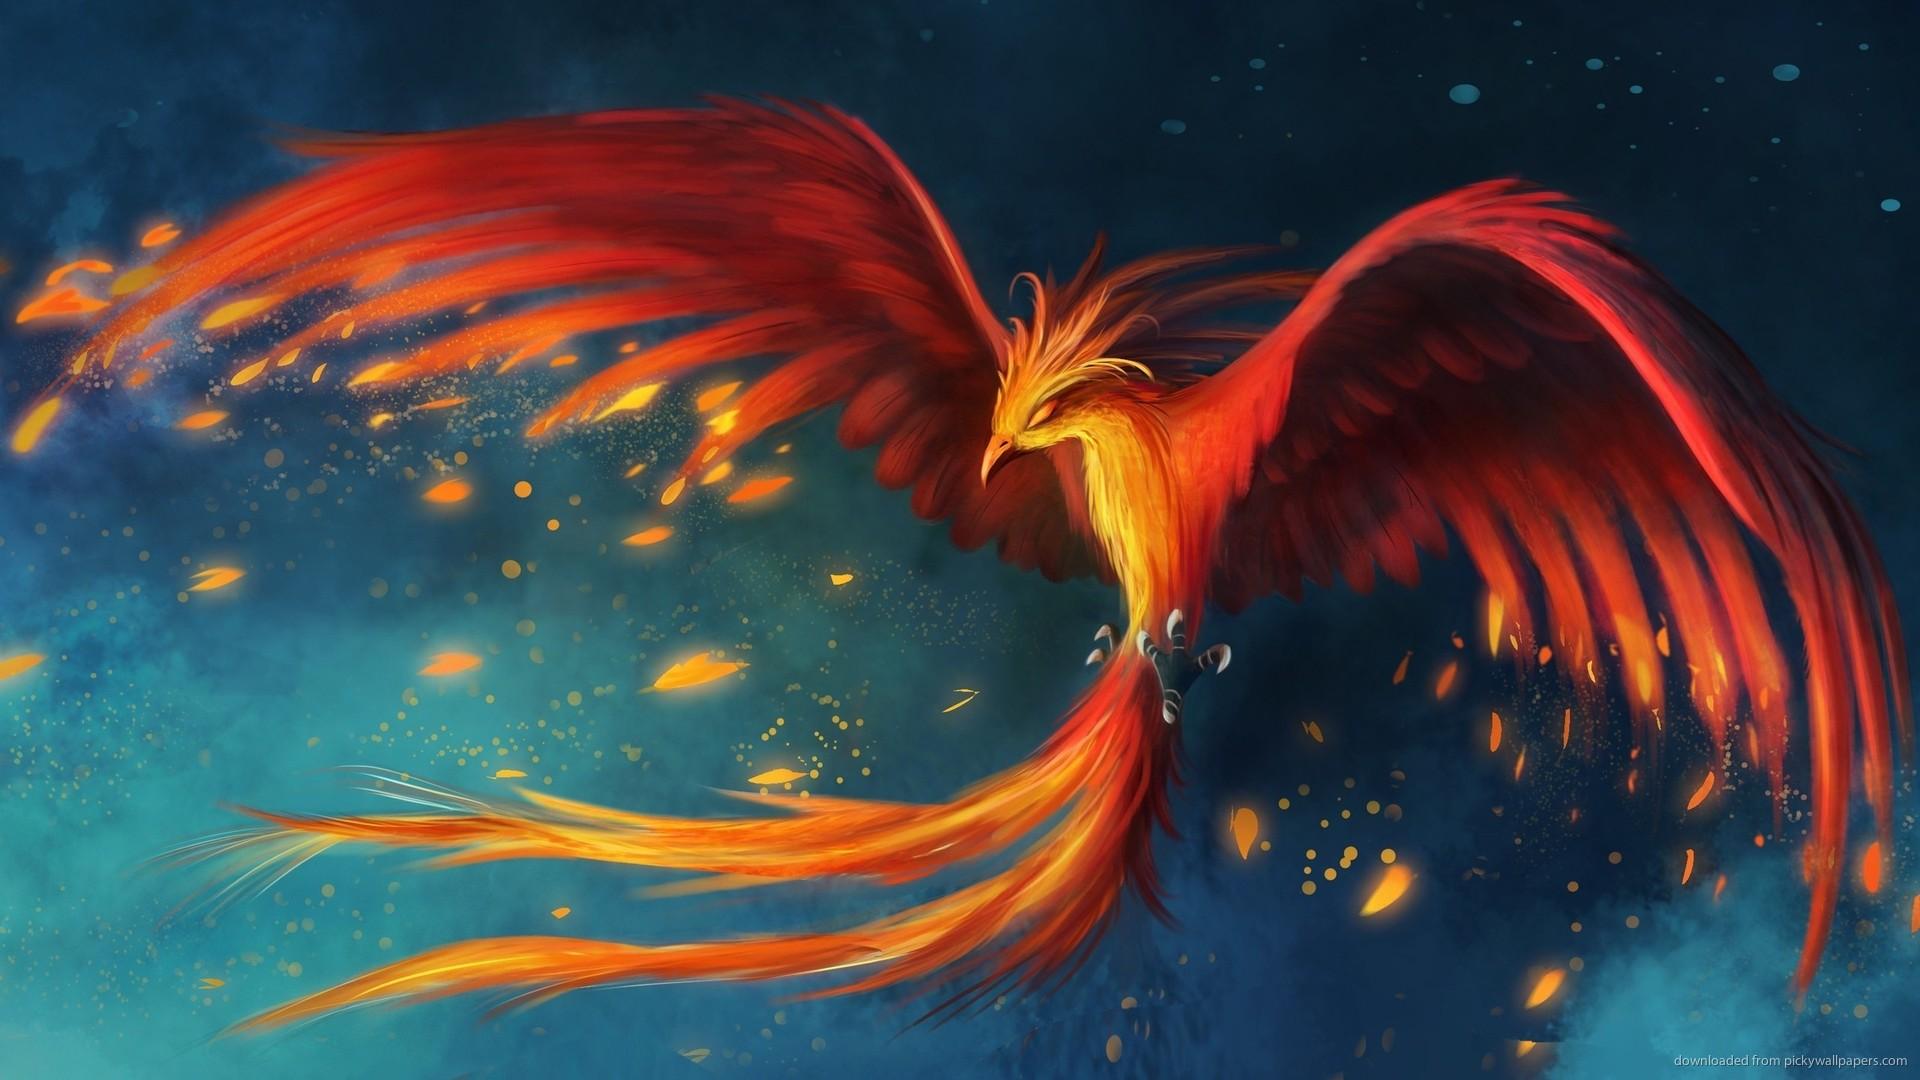 Phoenix Bird picture 1920x1080